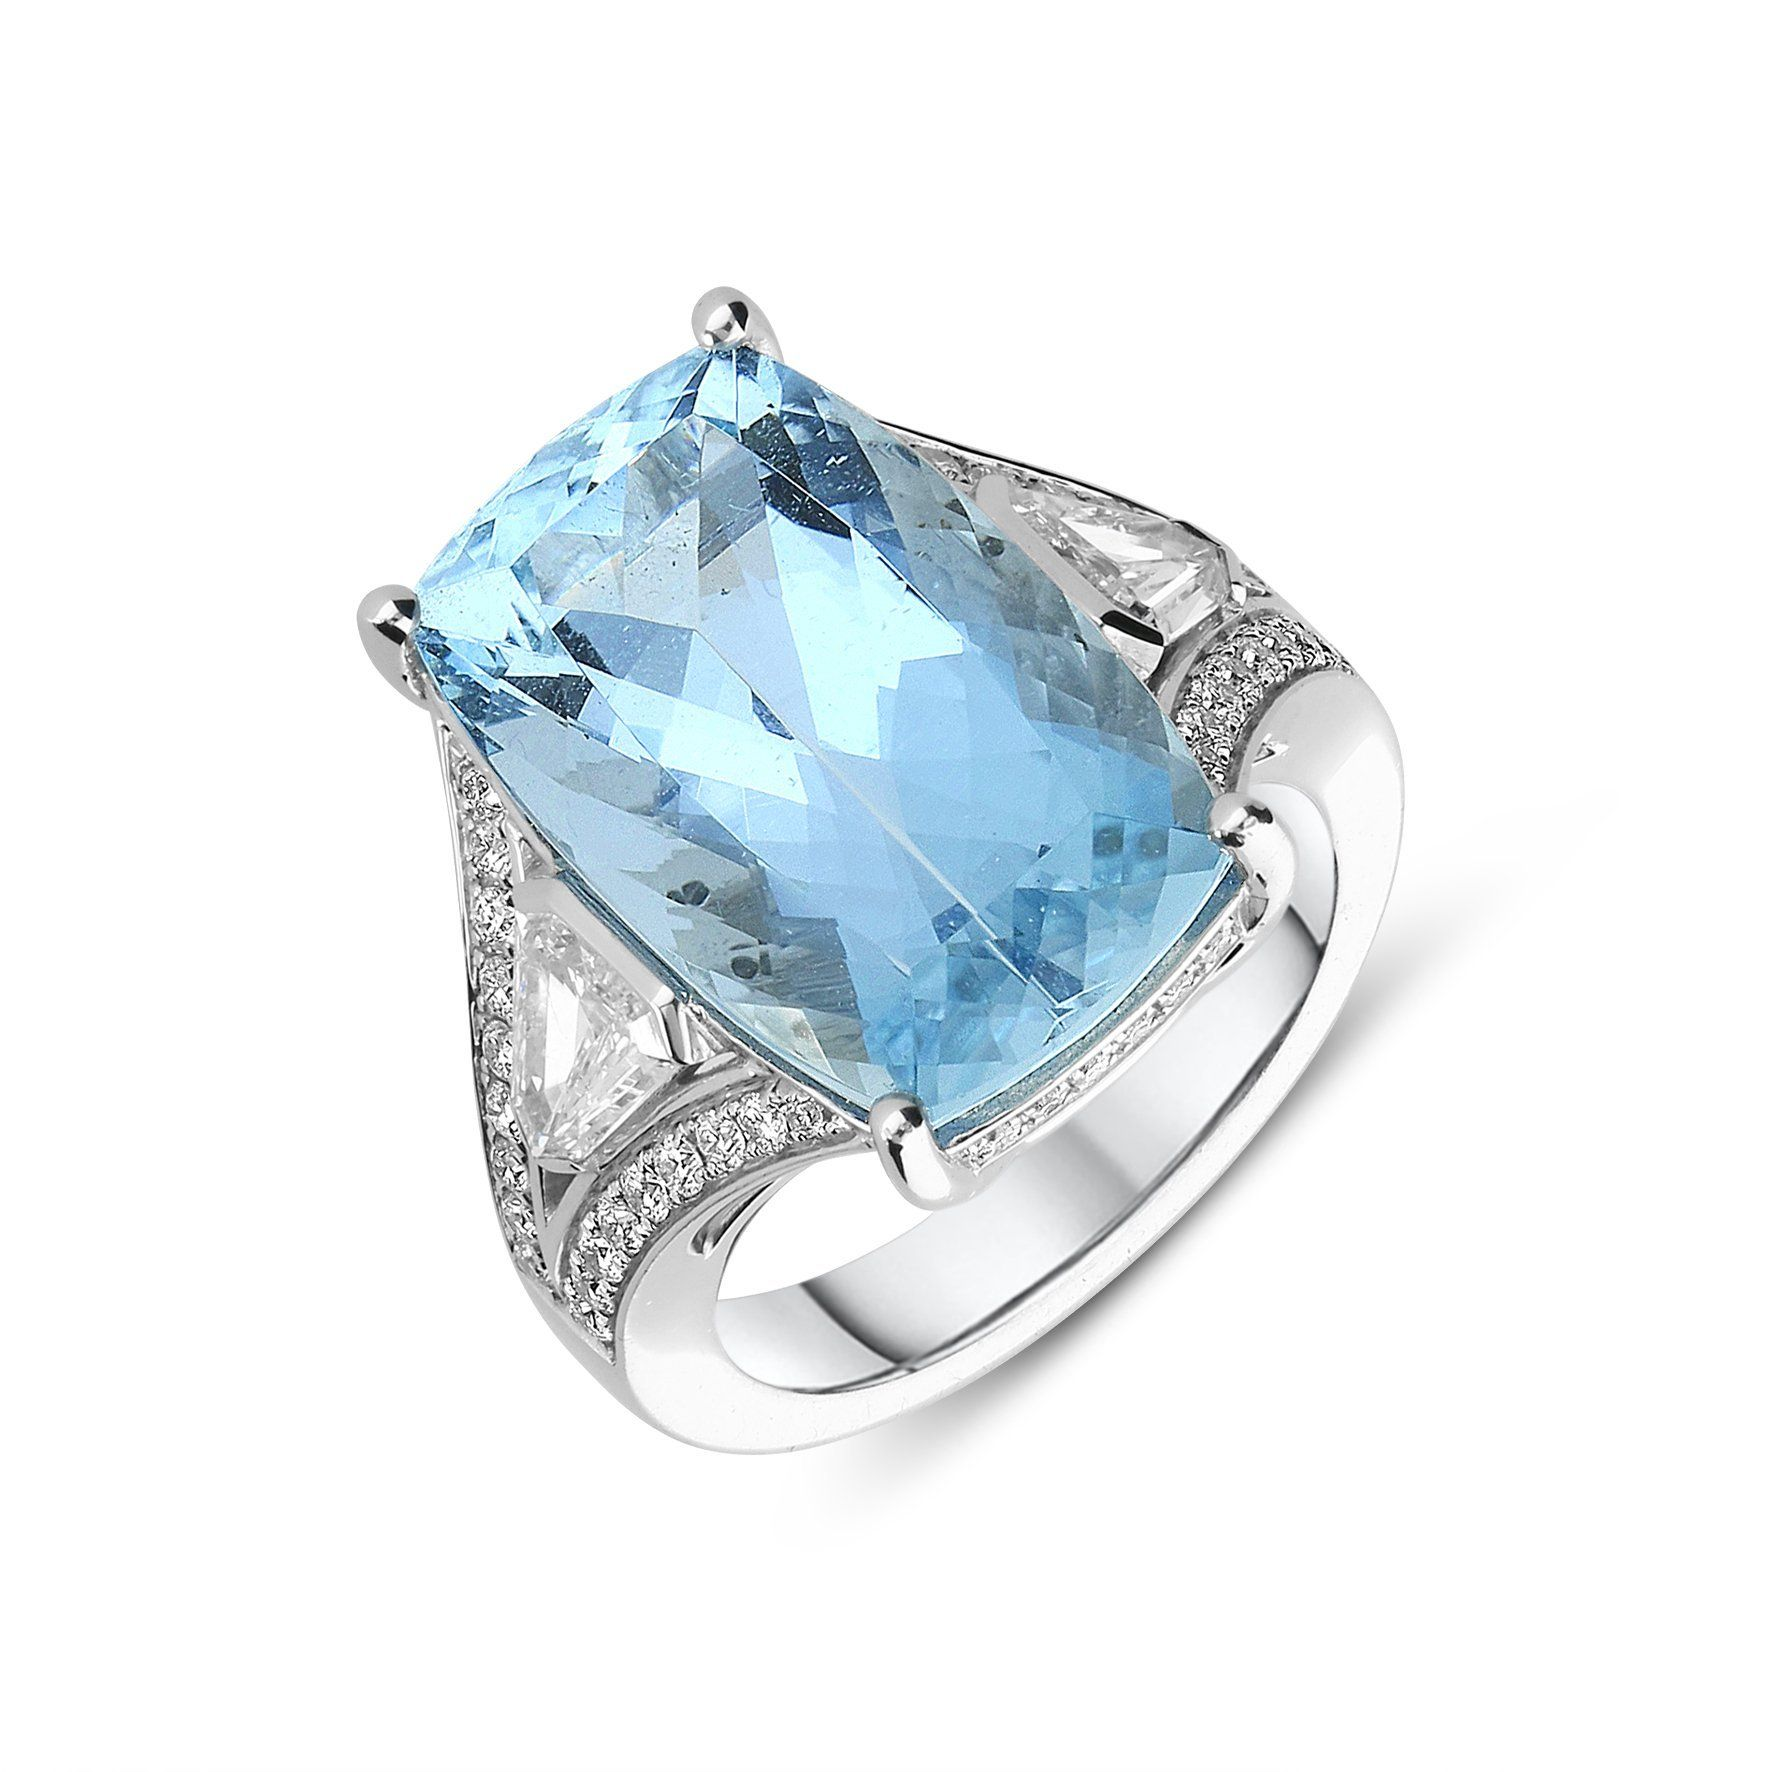 18ct White Gold 11.17ct Aquamarine Diamond Ring in 2020